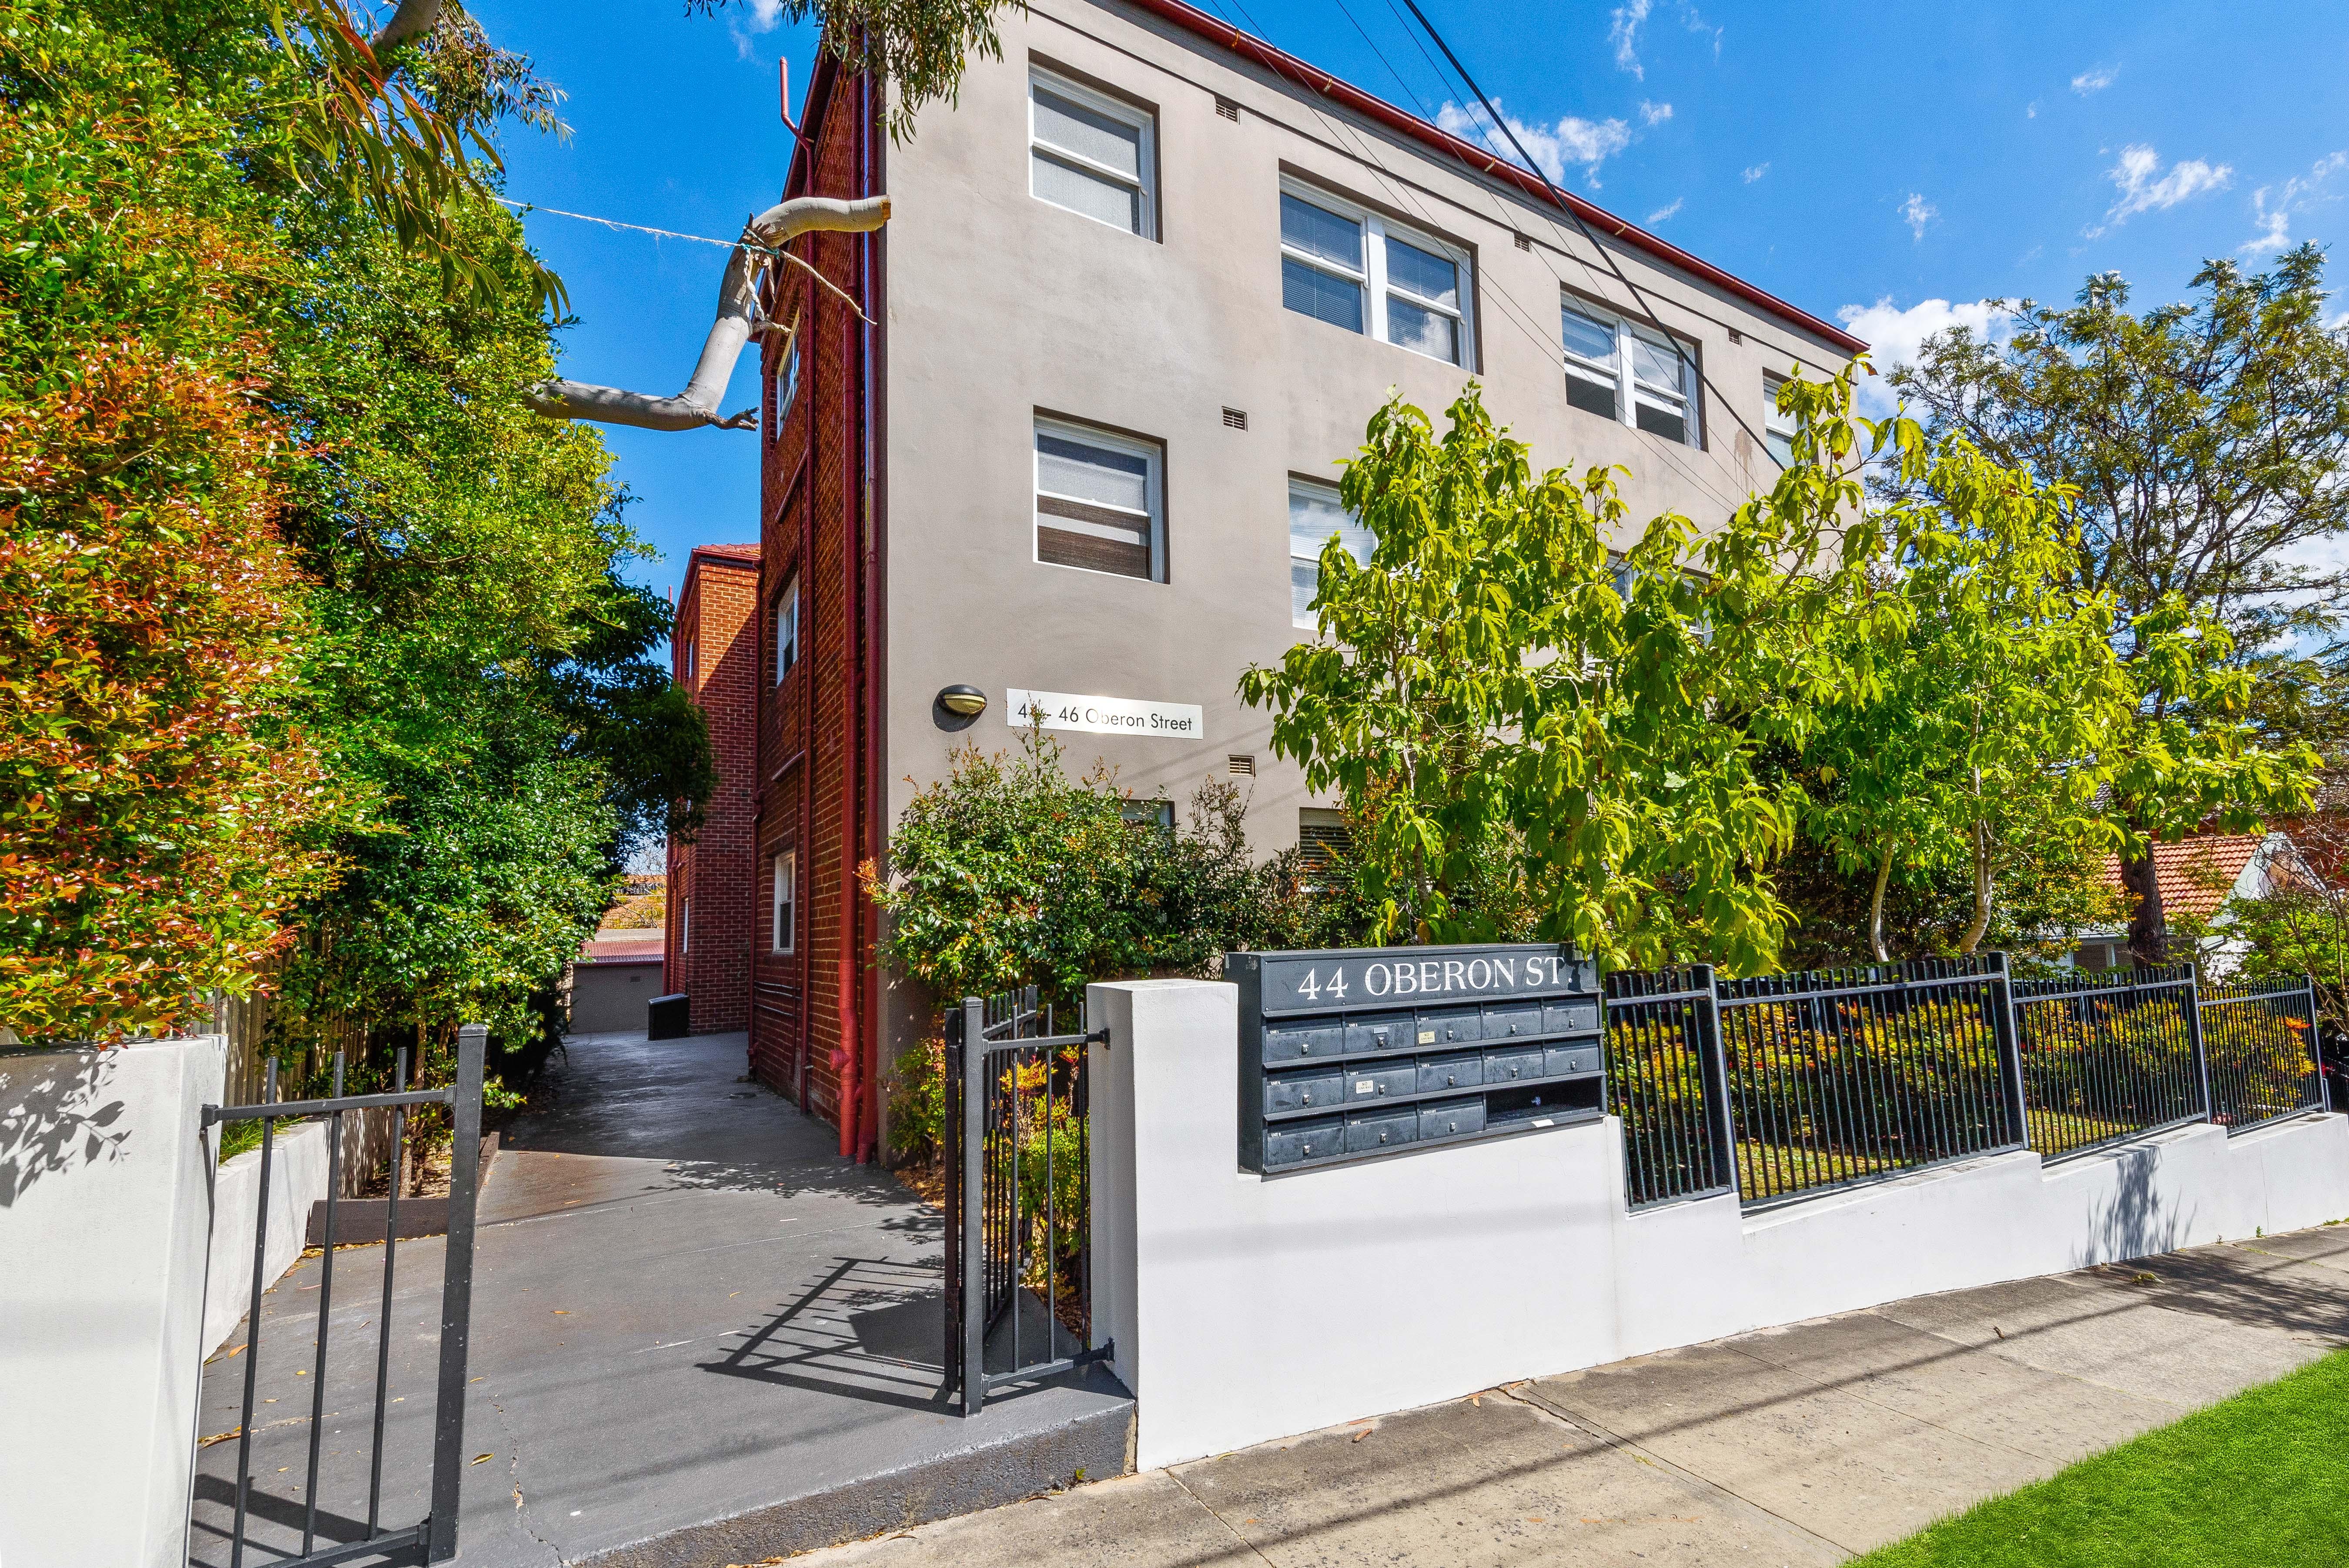 Apartment 1 44 Oberon Street Randwick A